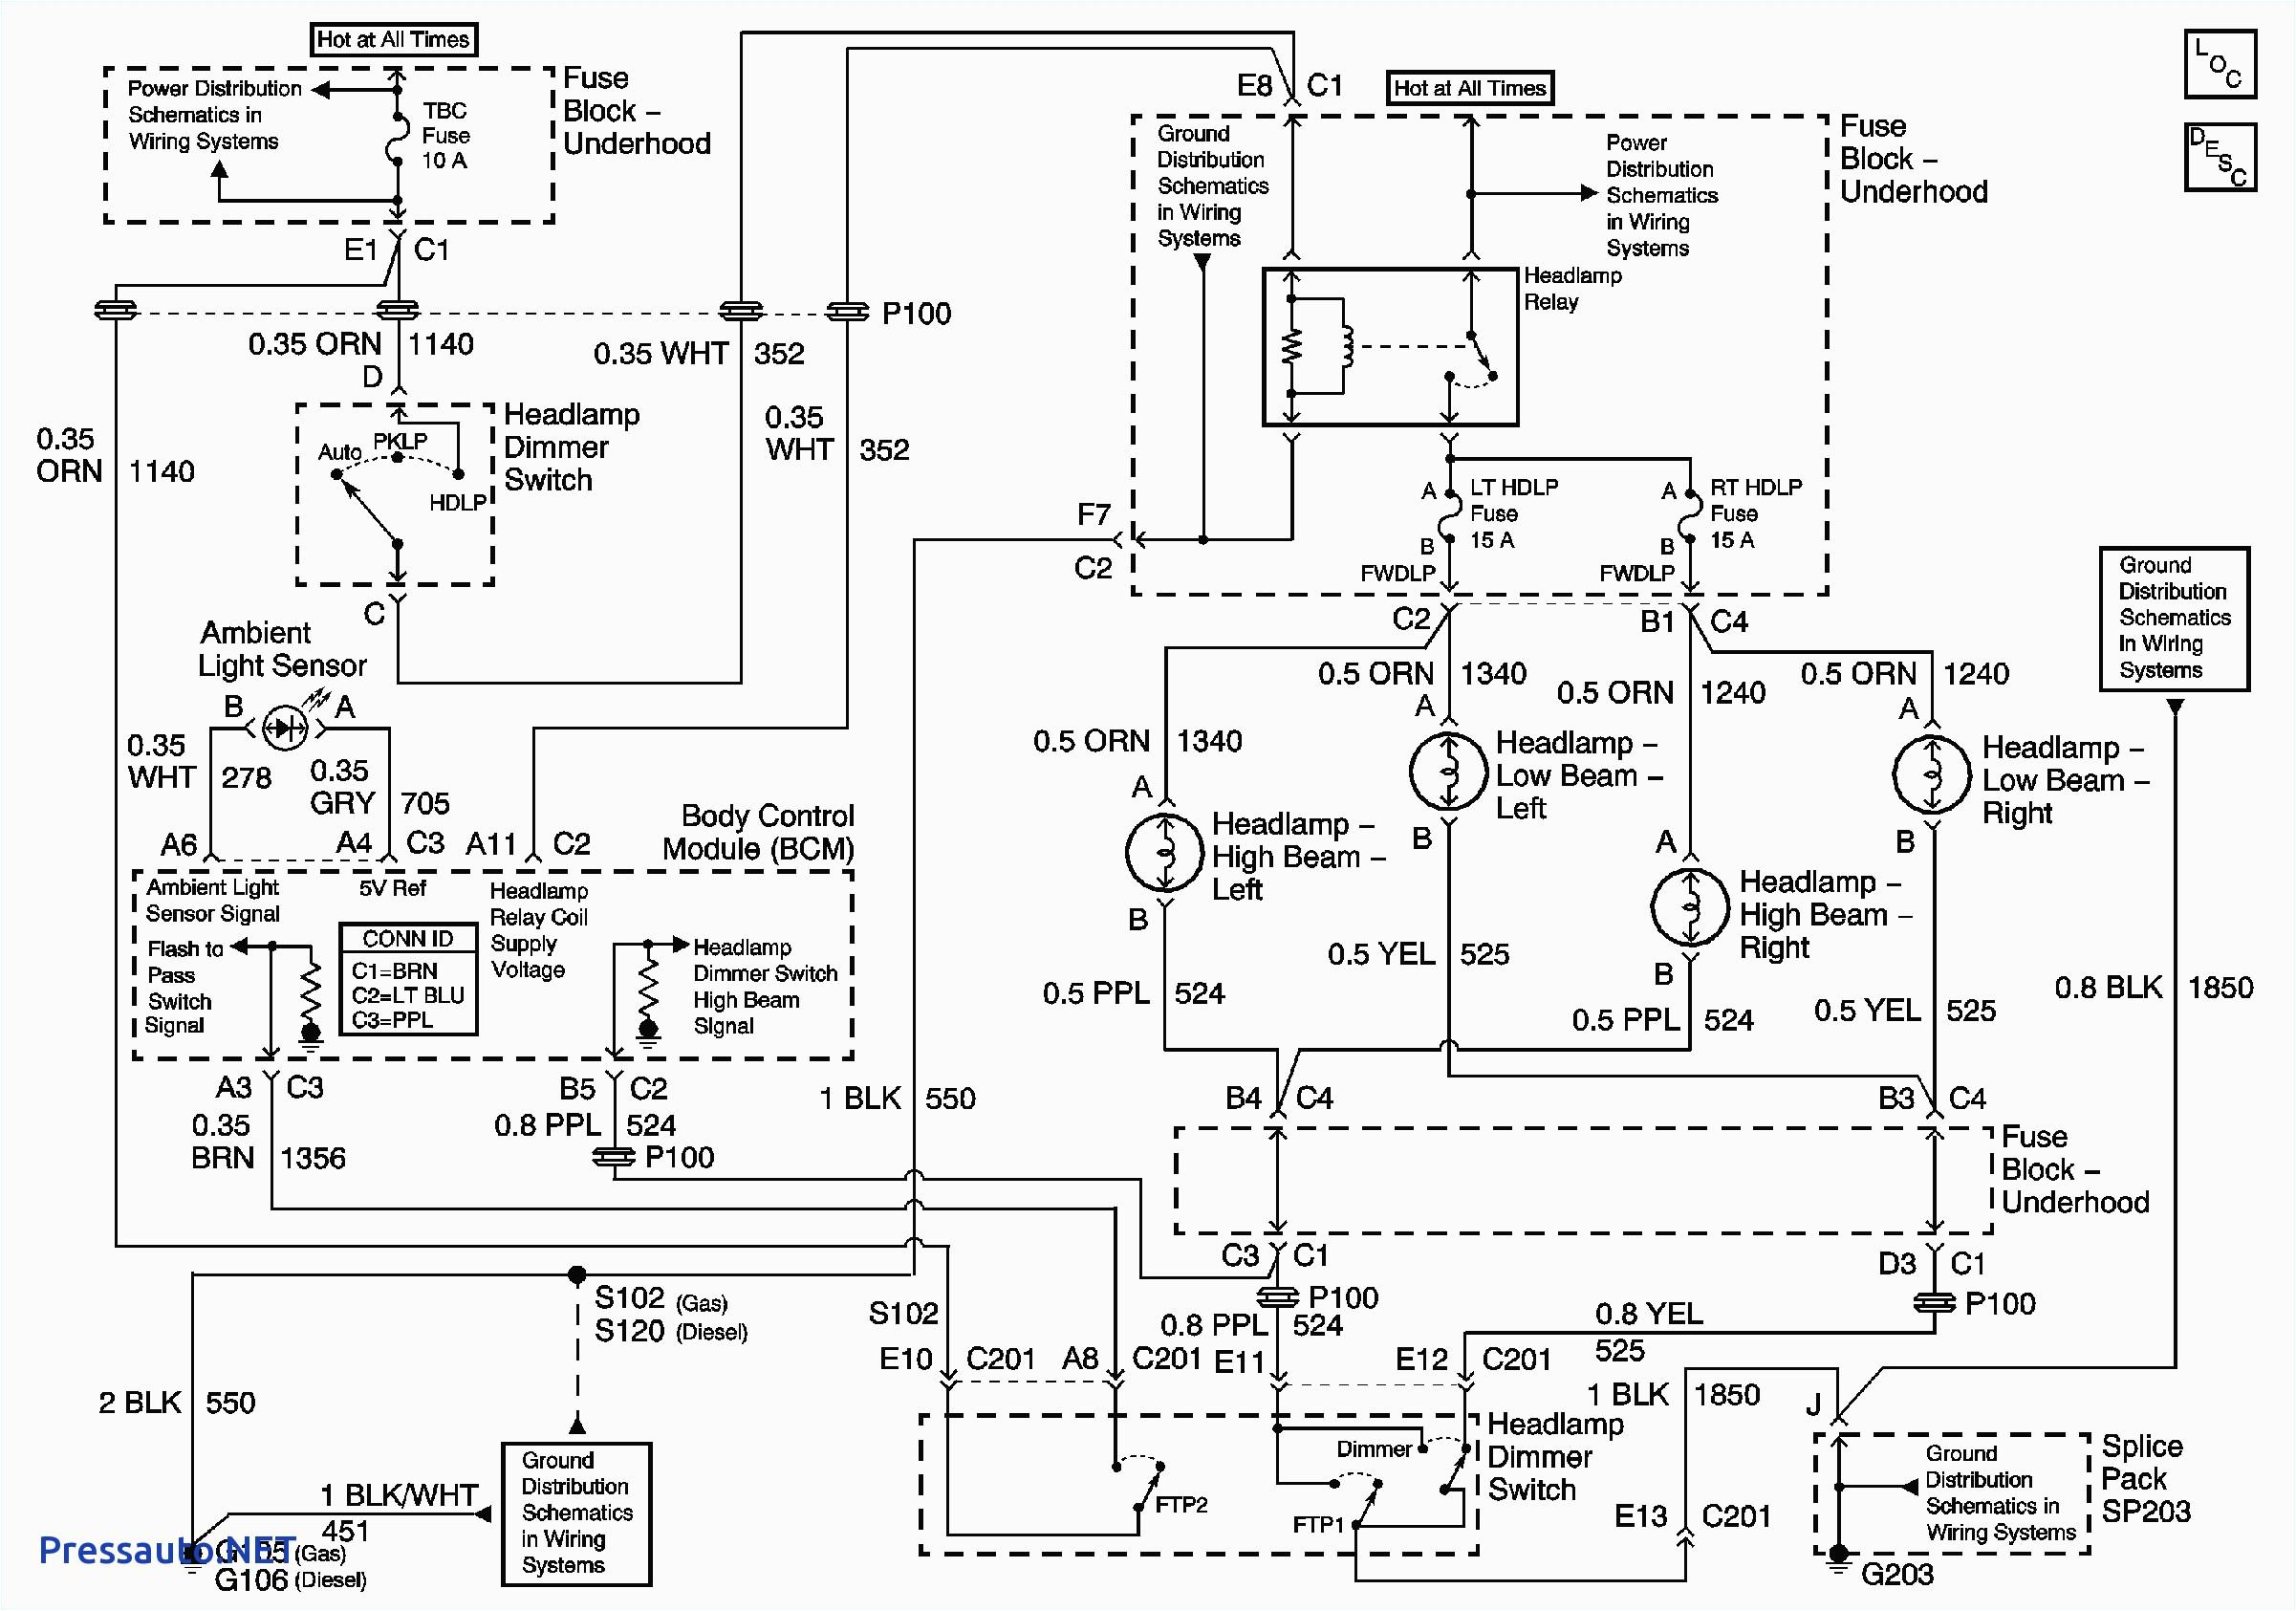 2002 chevy silverado wiring diagram wiring diagram load 2002 chevy 2500hd headlight wiring diagram 2002 chevy headlight wiring diagram